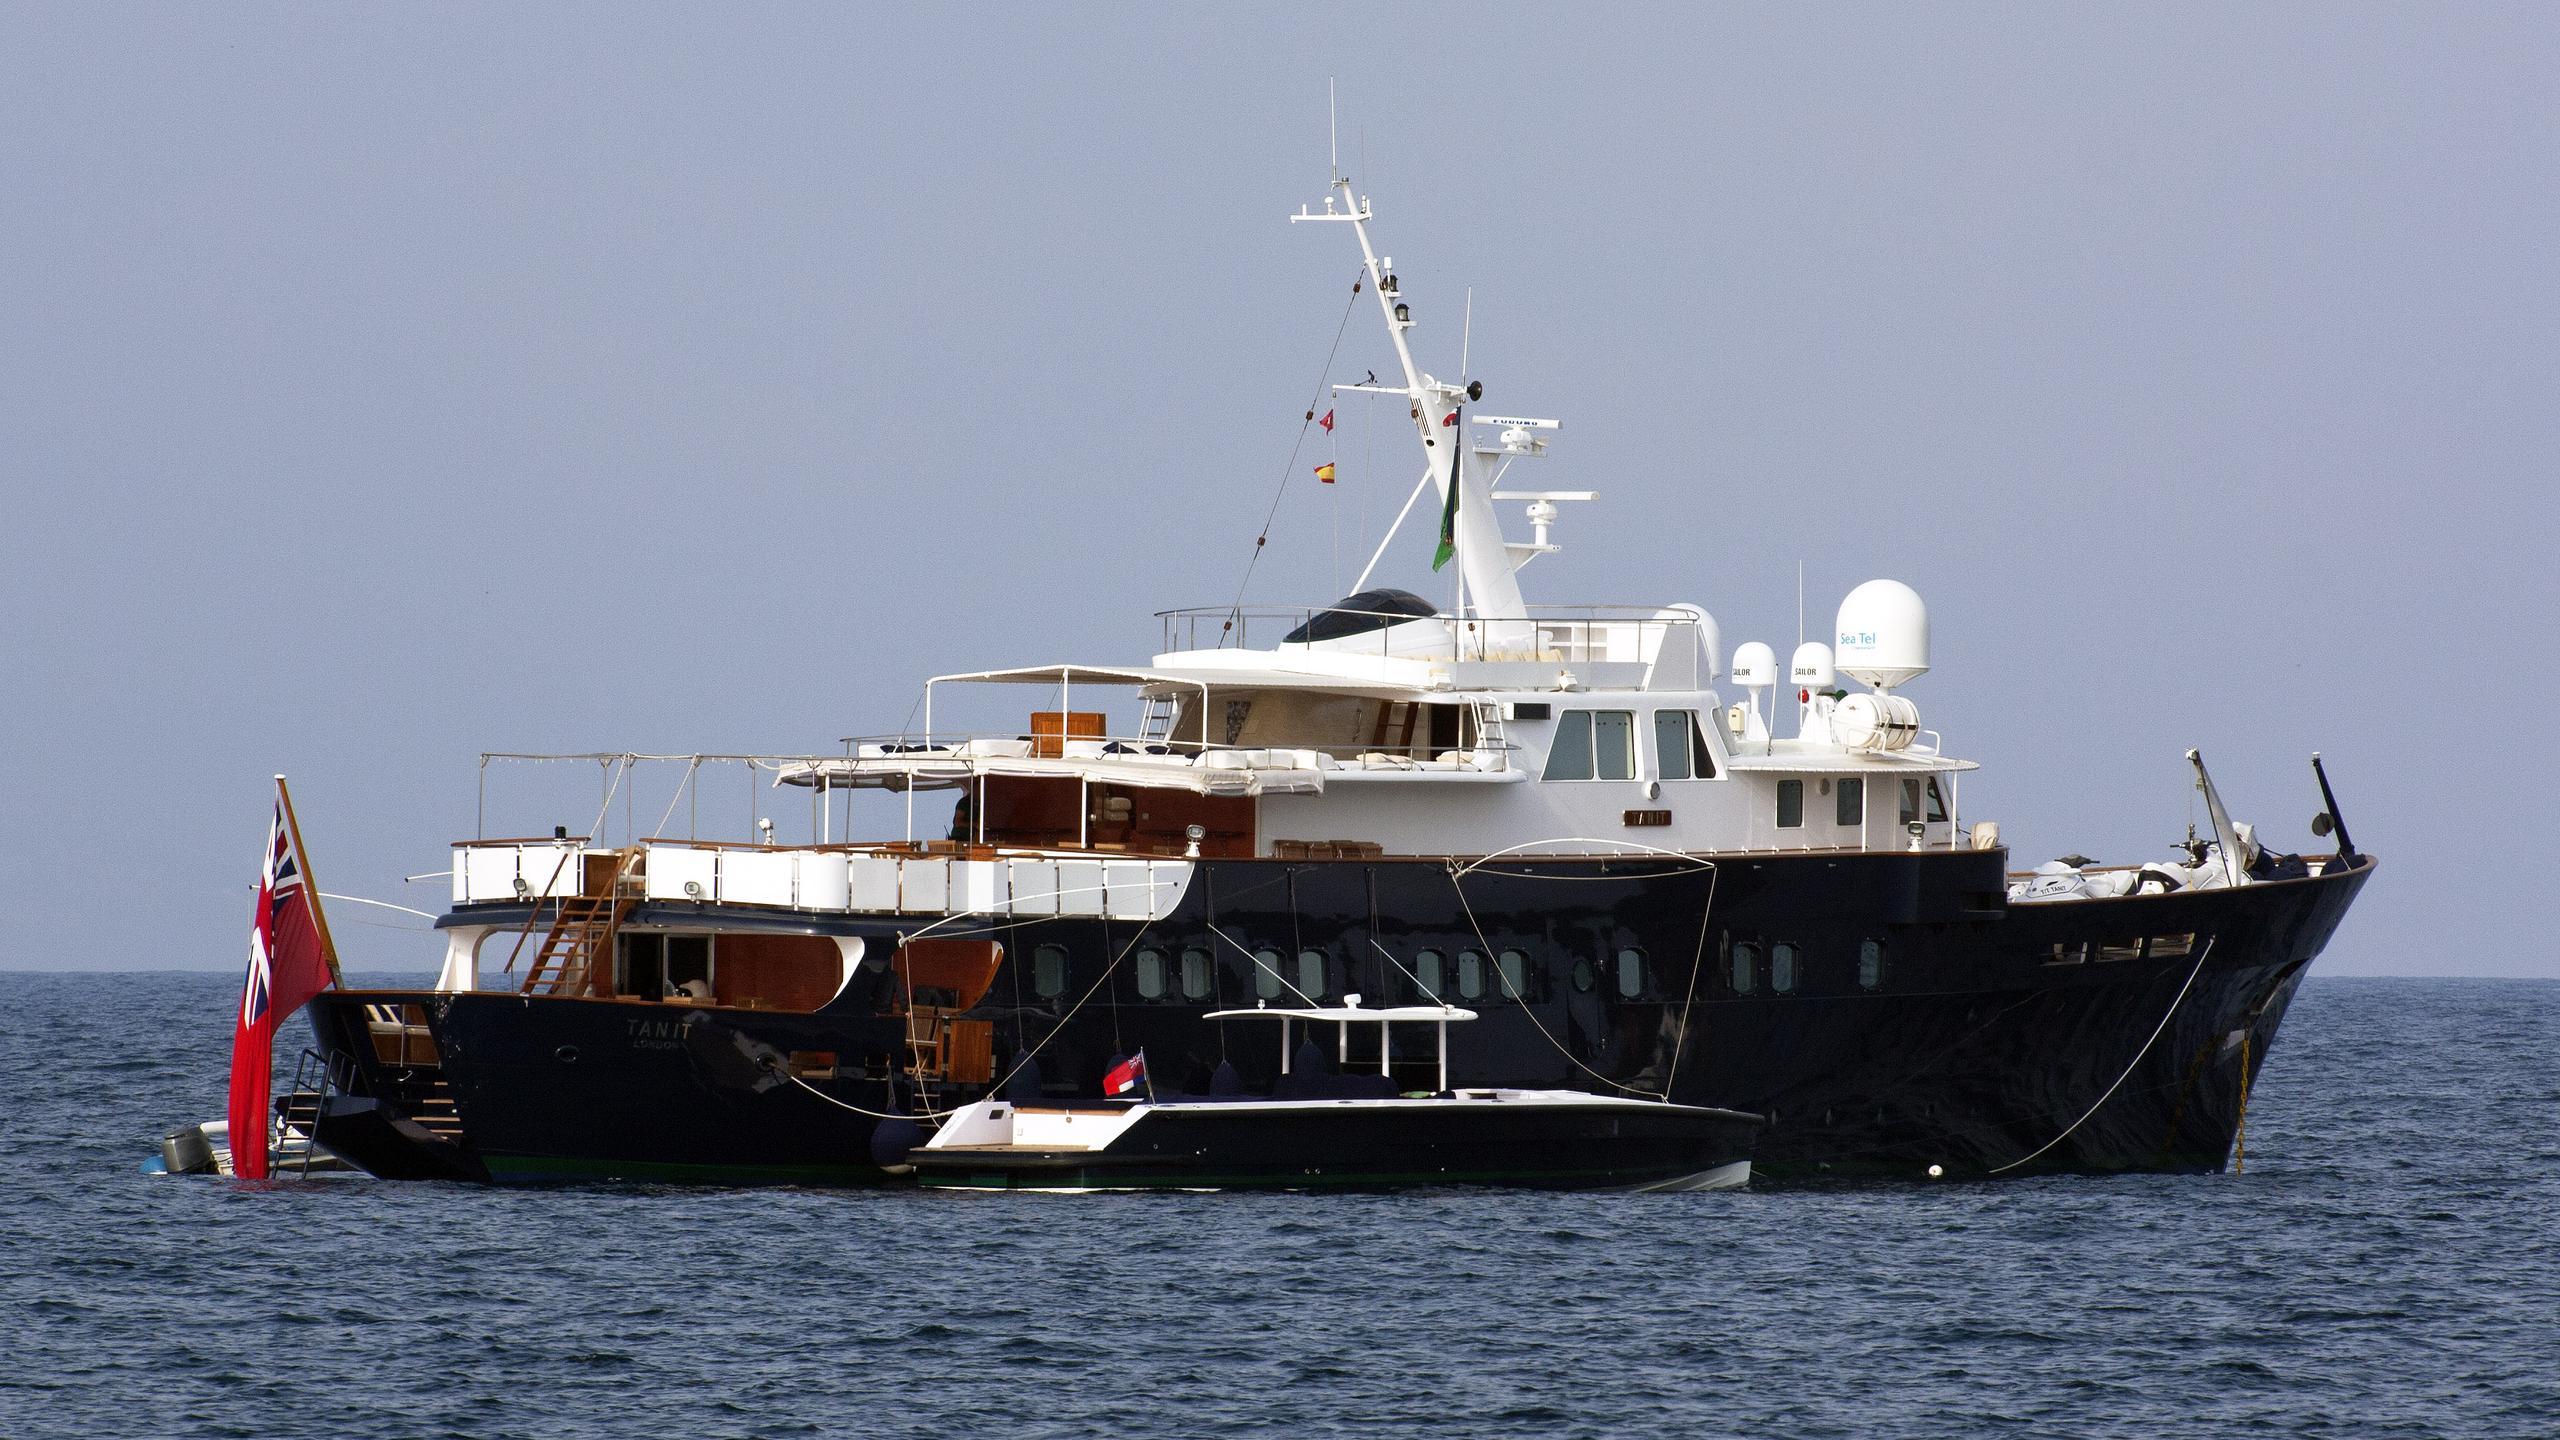 tanit-motor-yacht-camper-nicholsons-1967-46m-half-profile